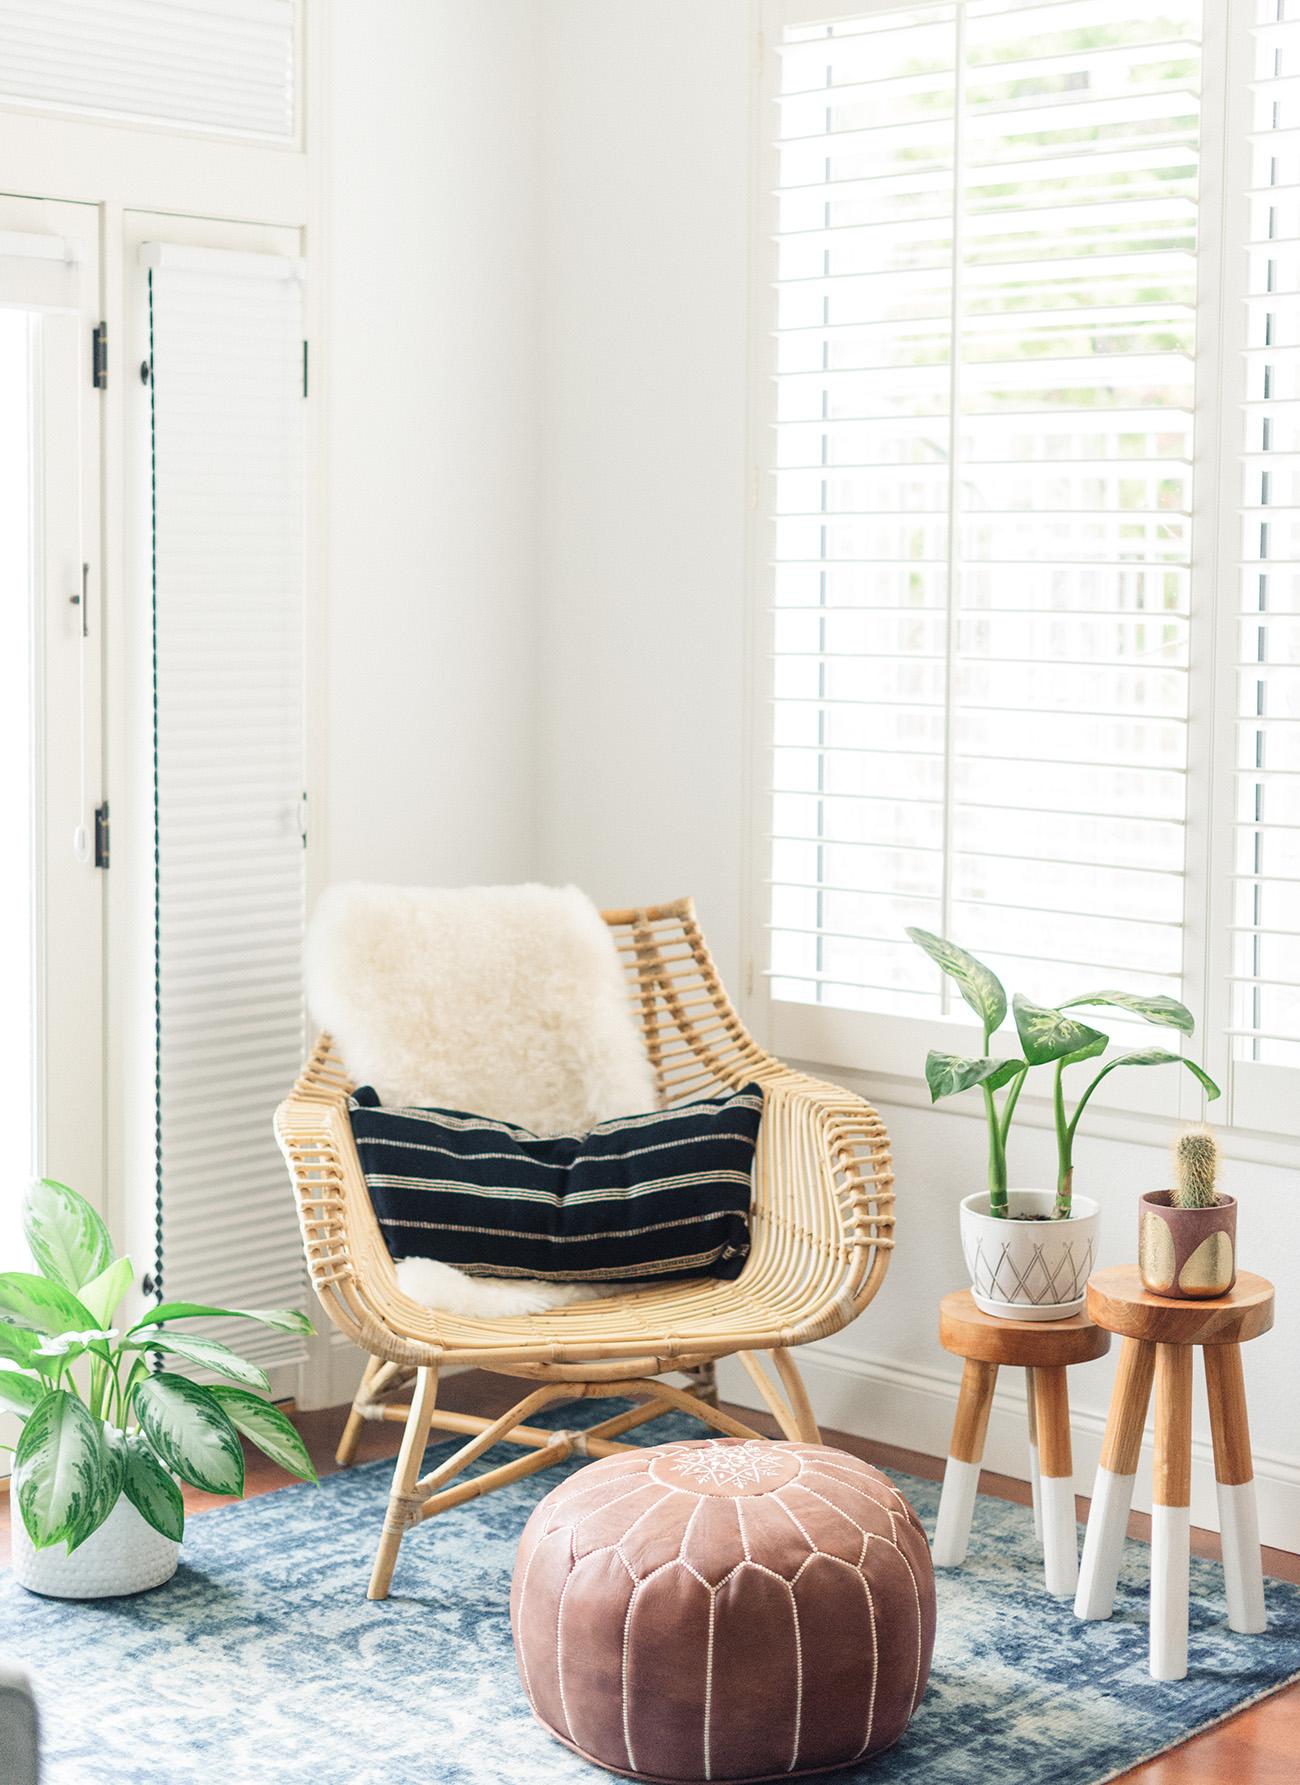 Cali Beachy Boho Bedroom